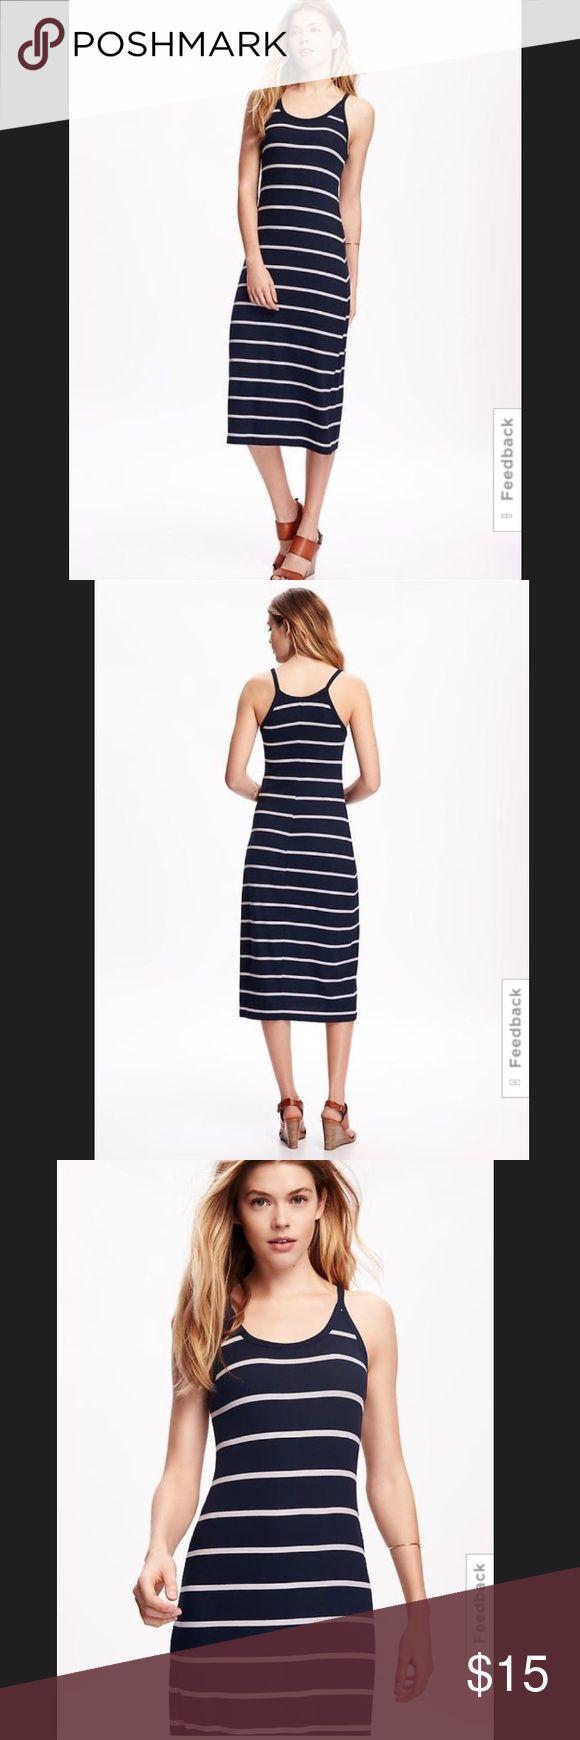 Rib-Knit Halter Midi Dress for Women Midi length. Dress hits below knee. Fitted through body. Old Navy Dresses Maxi